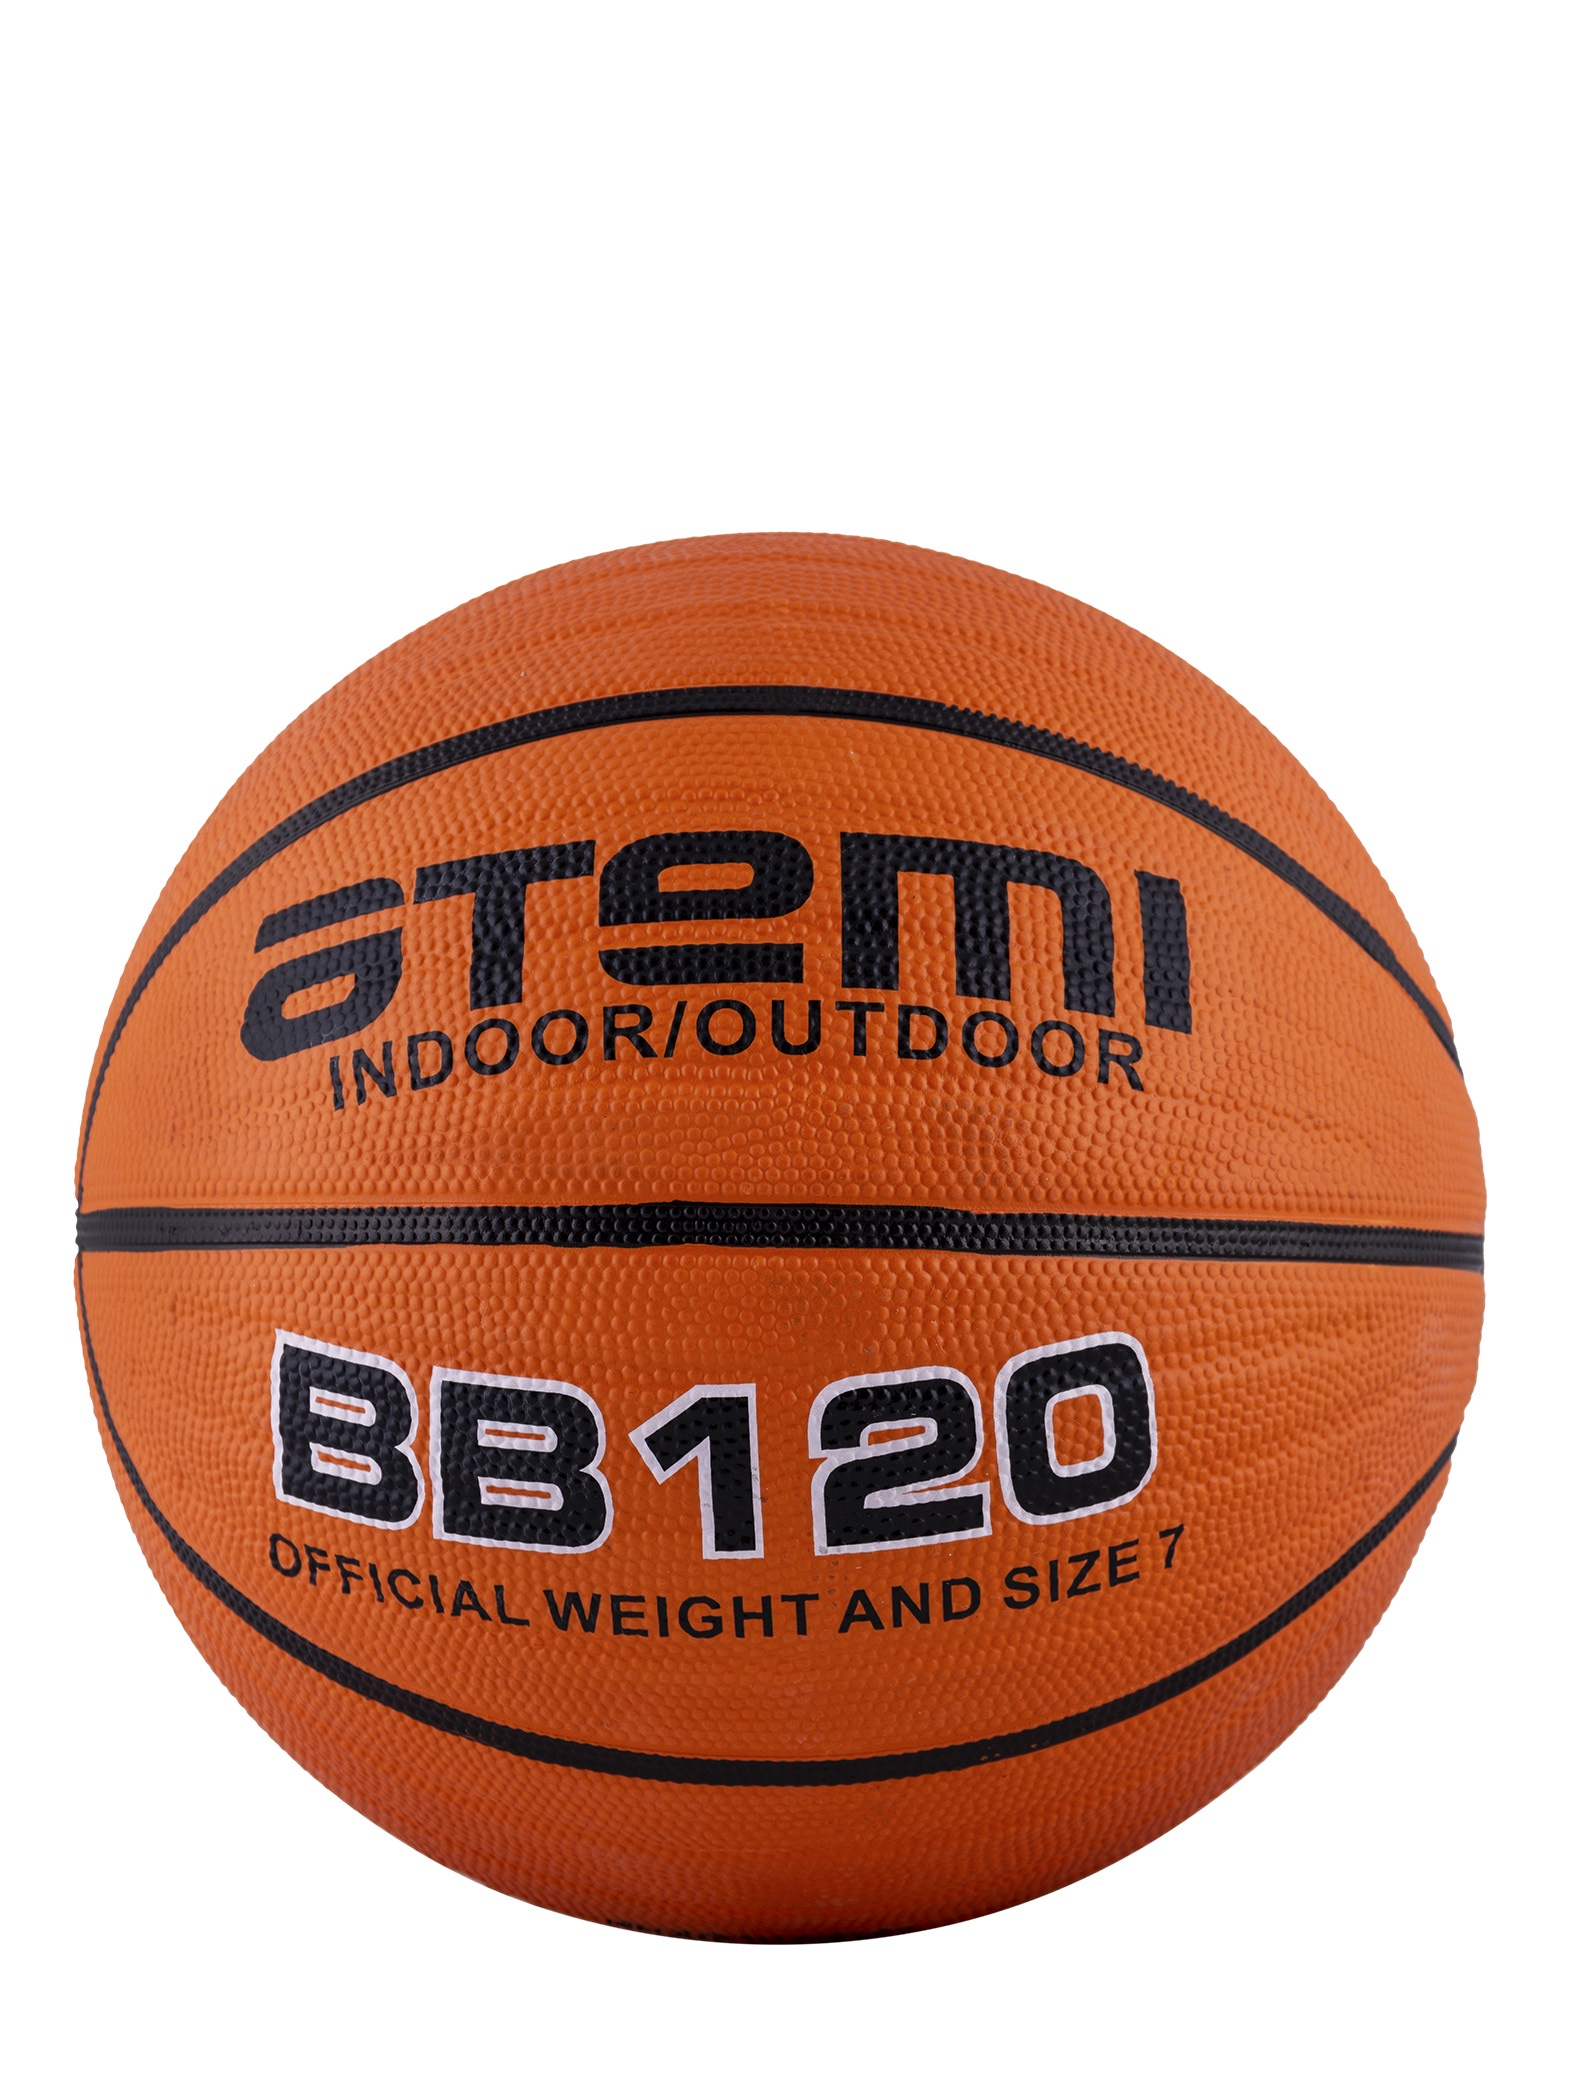 Мяч баскетбольный Atemi BB120, белый, оранжевый мяч баскетбольный atemi bb400 7